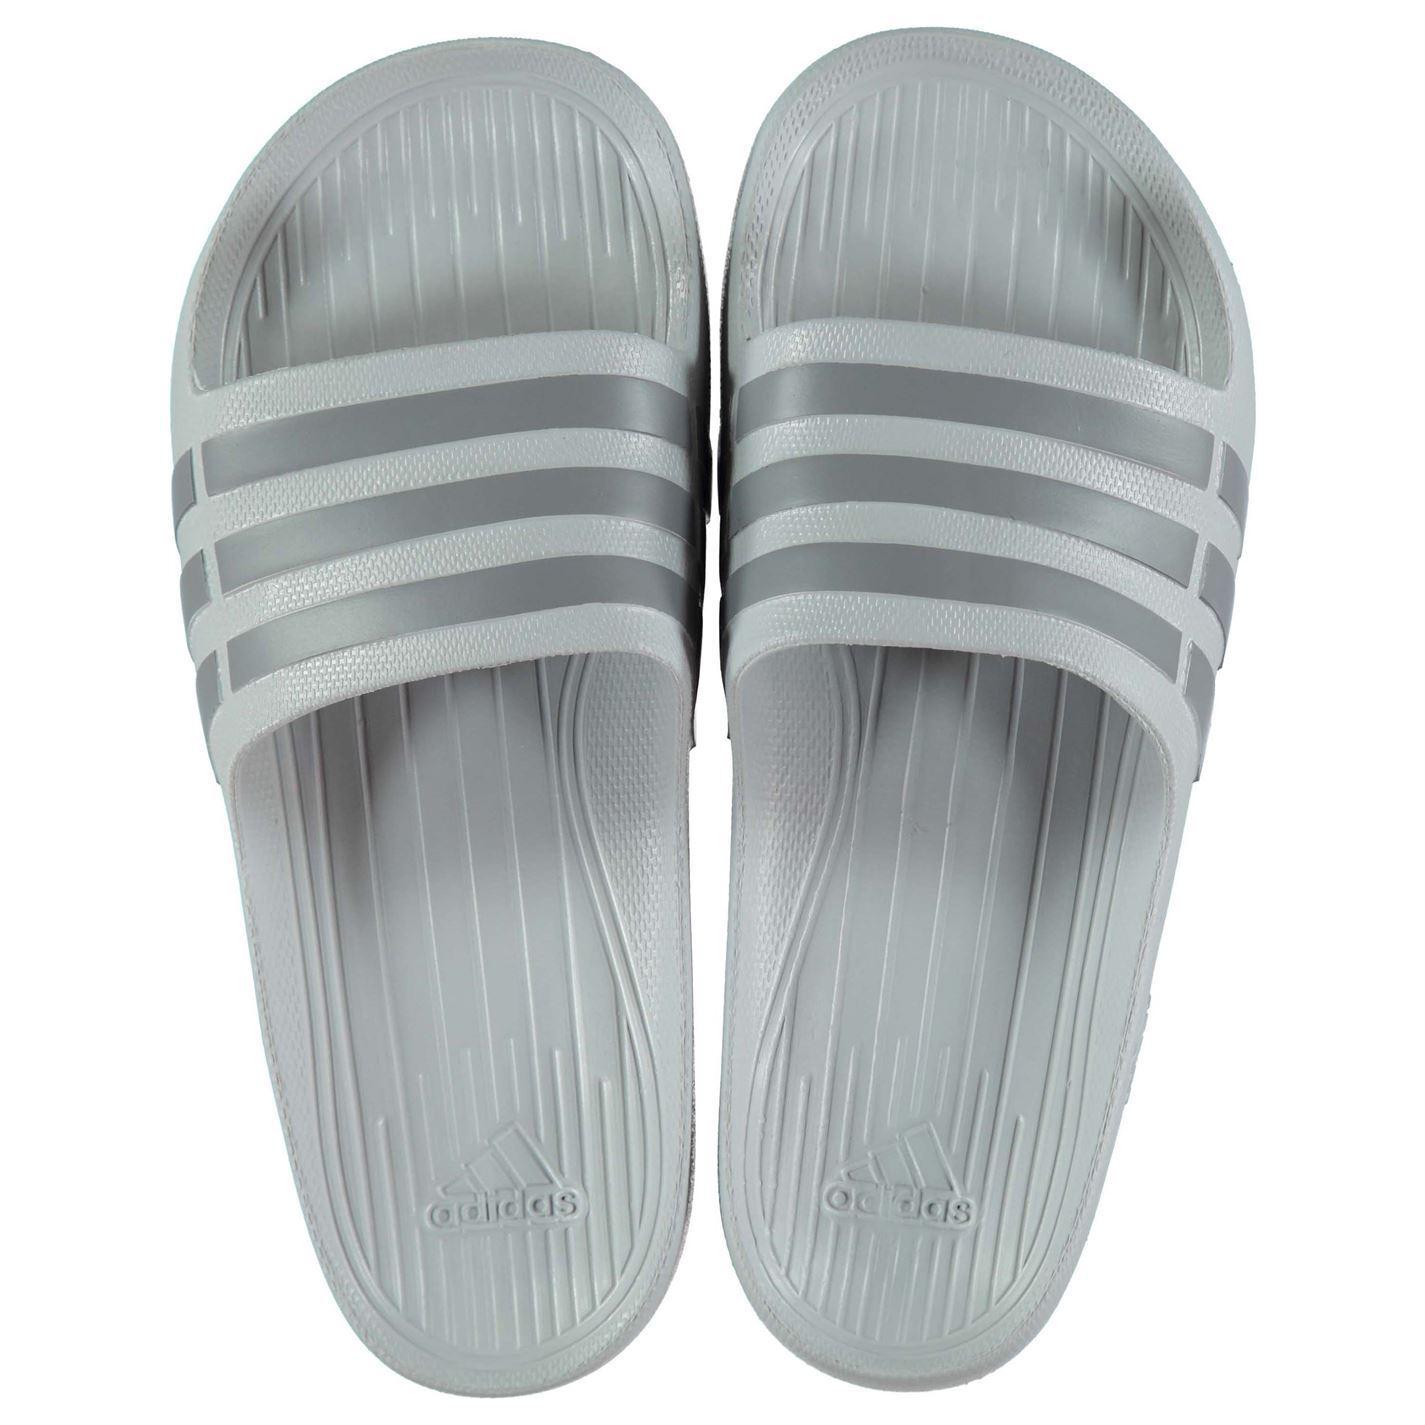 NEW Adidas Hombre Hombre Adidas Duramo Sliders Flip Flops  Clear Onix Gray Talla FROM 4-14 6d58bd